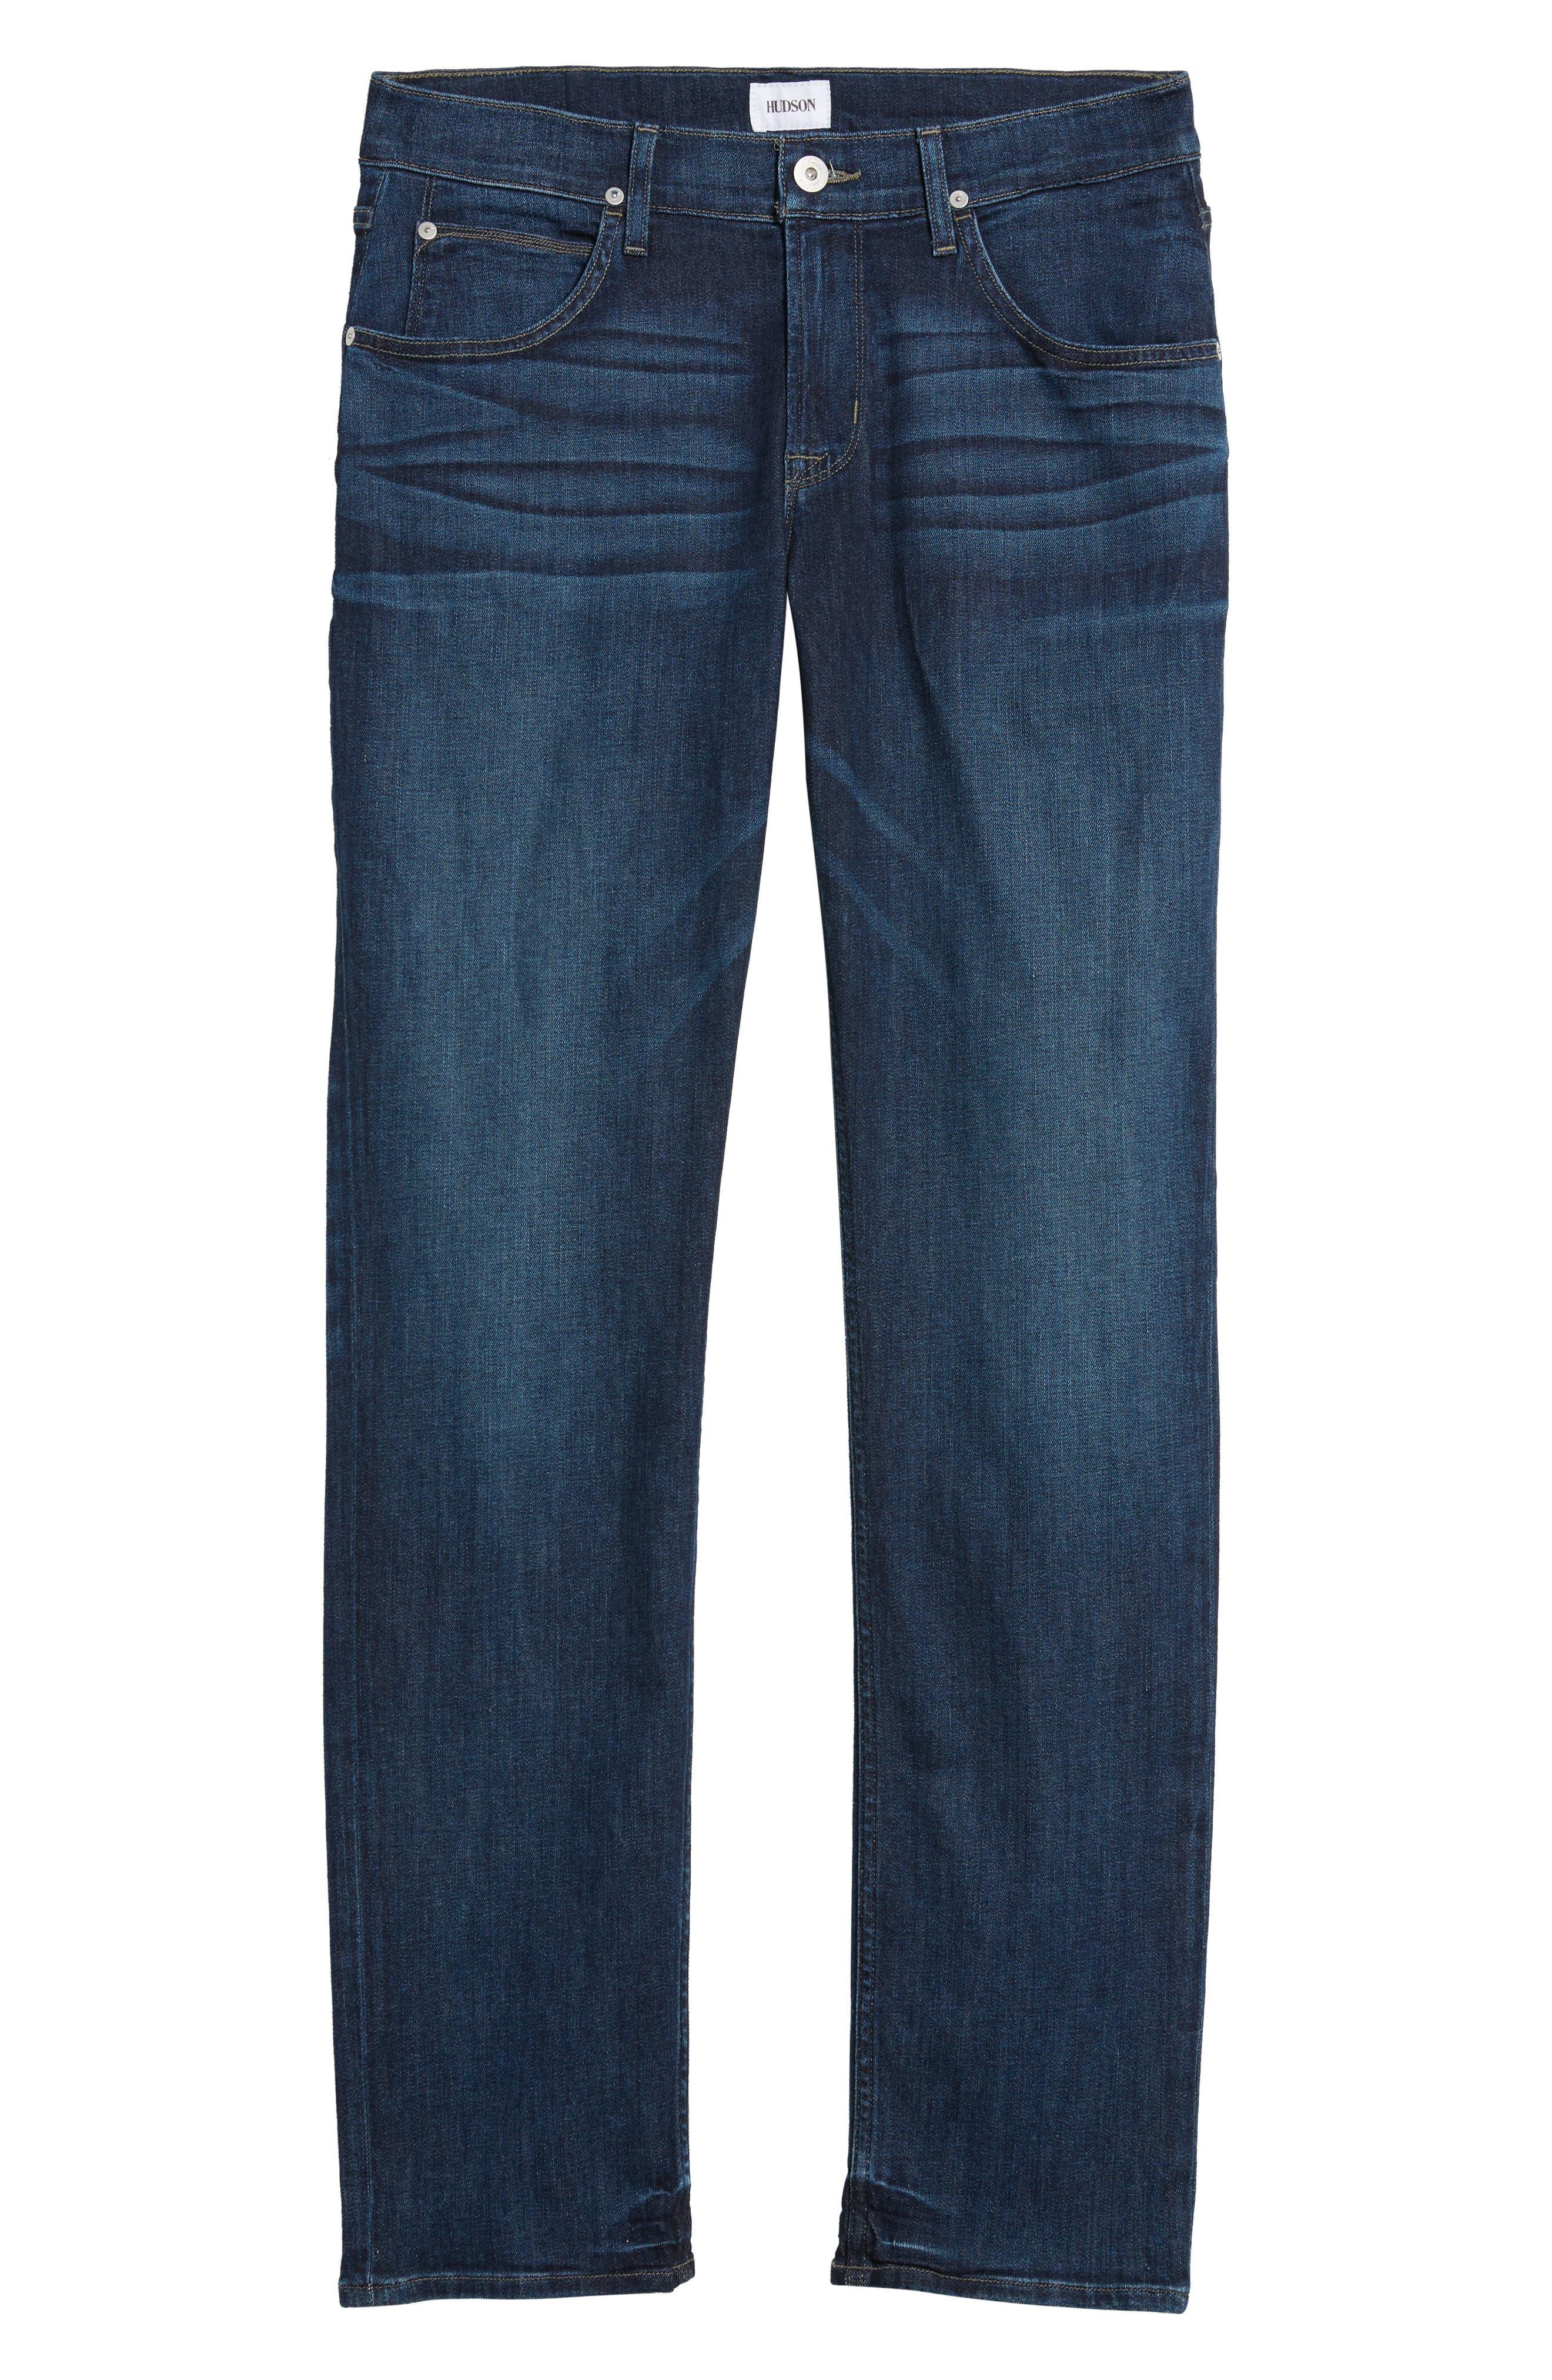 Byron Slim Straight Fit Jeans,                             Alternate thumbnail 6, color,                             Draper